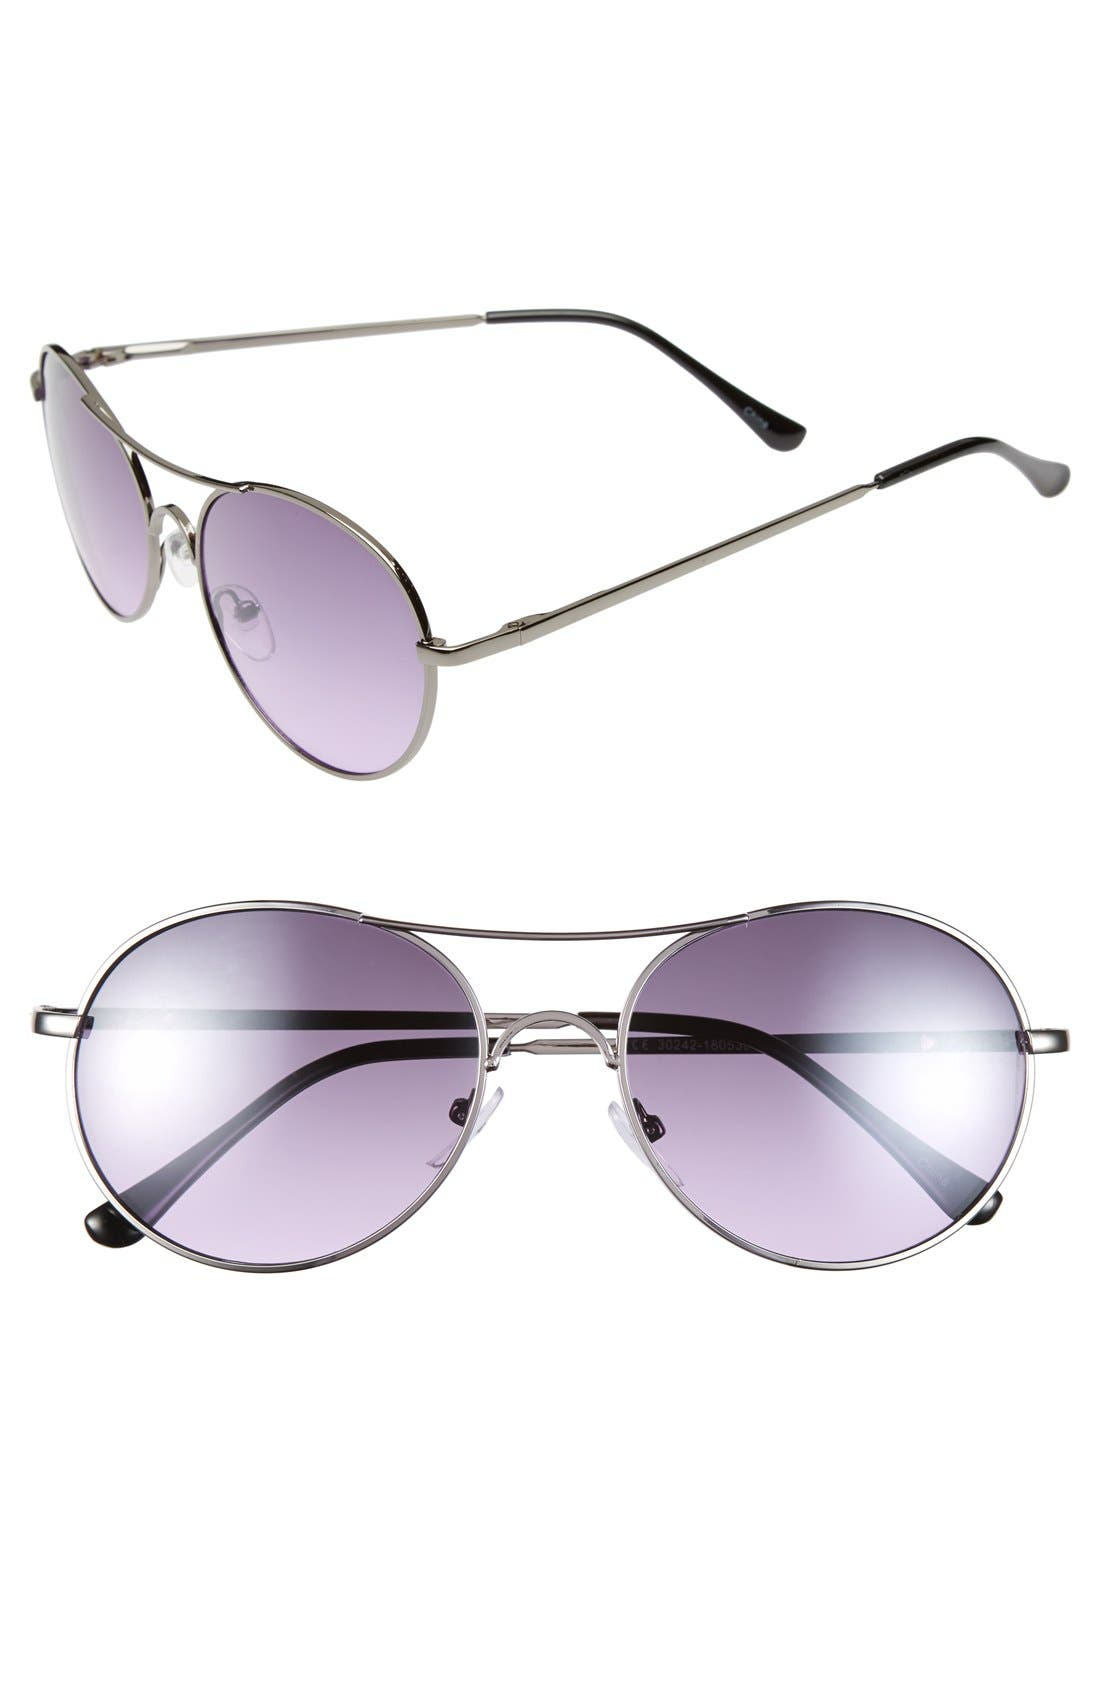 Main Image - Icon Eyewear 53mm Metal Aviator Sunglasses